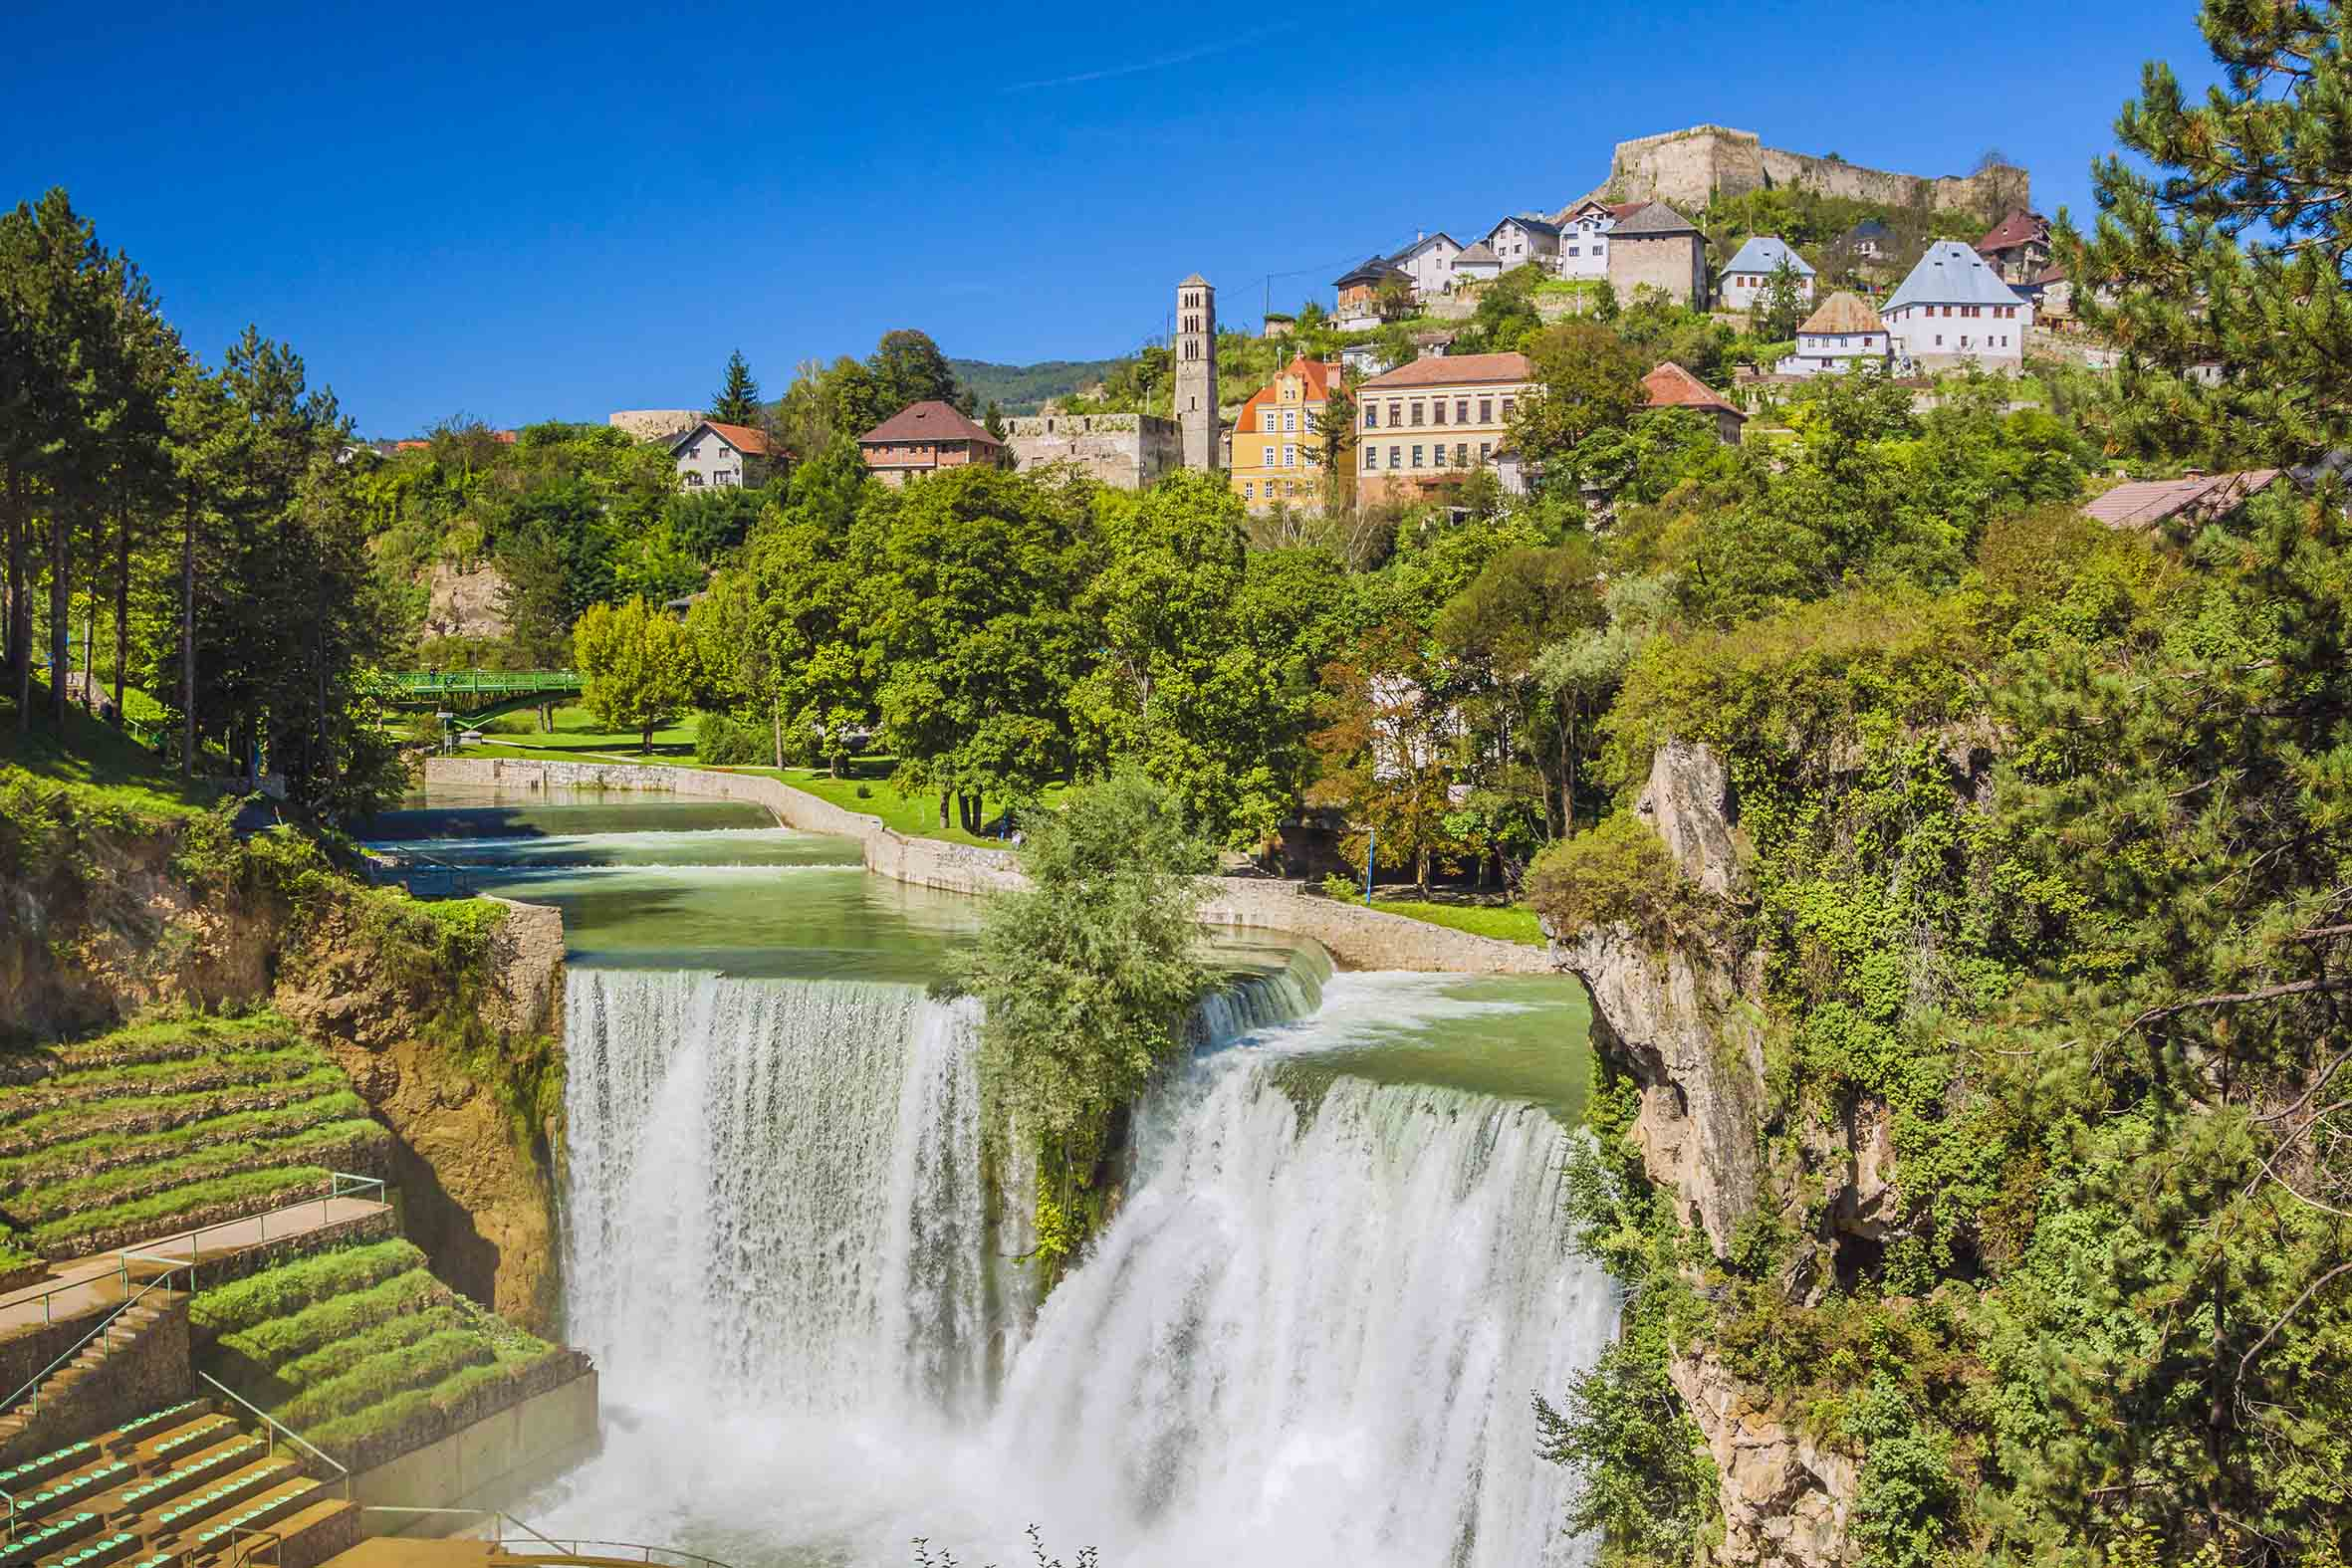 Bosnia and Herzegovina - Jajce